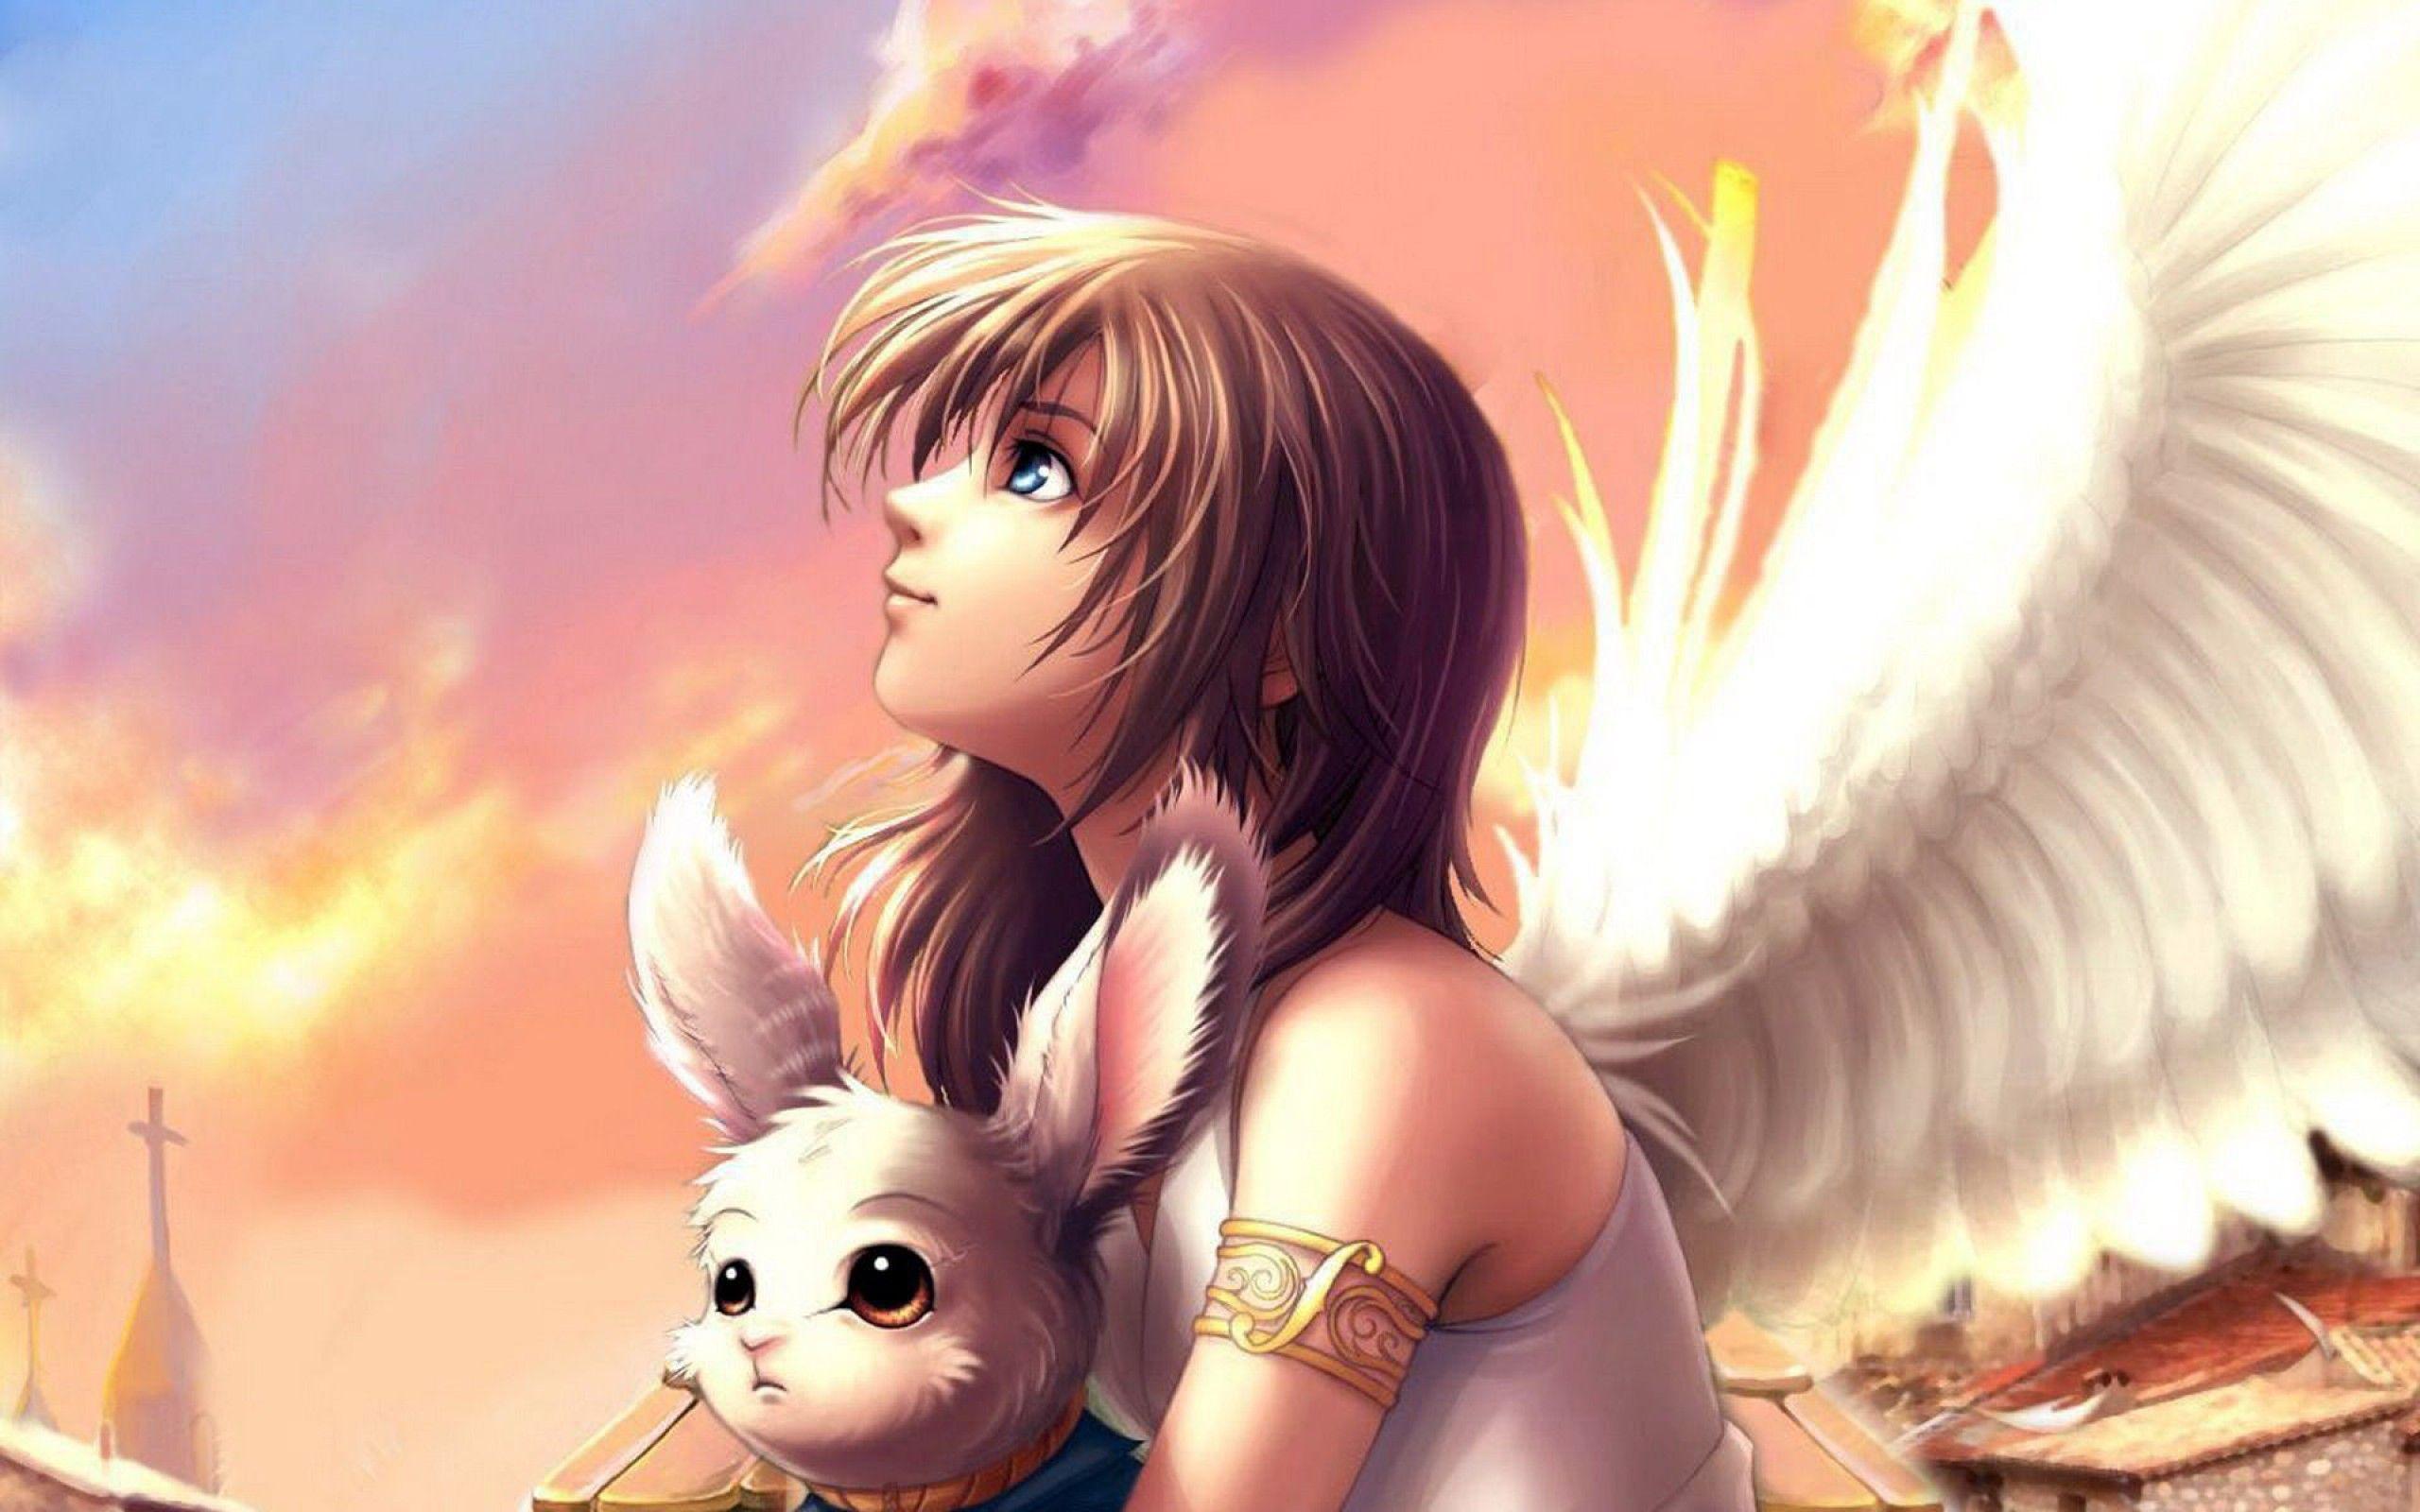 Anime Angel Wallpaper Desktop Background Anime Backgrounds